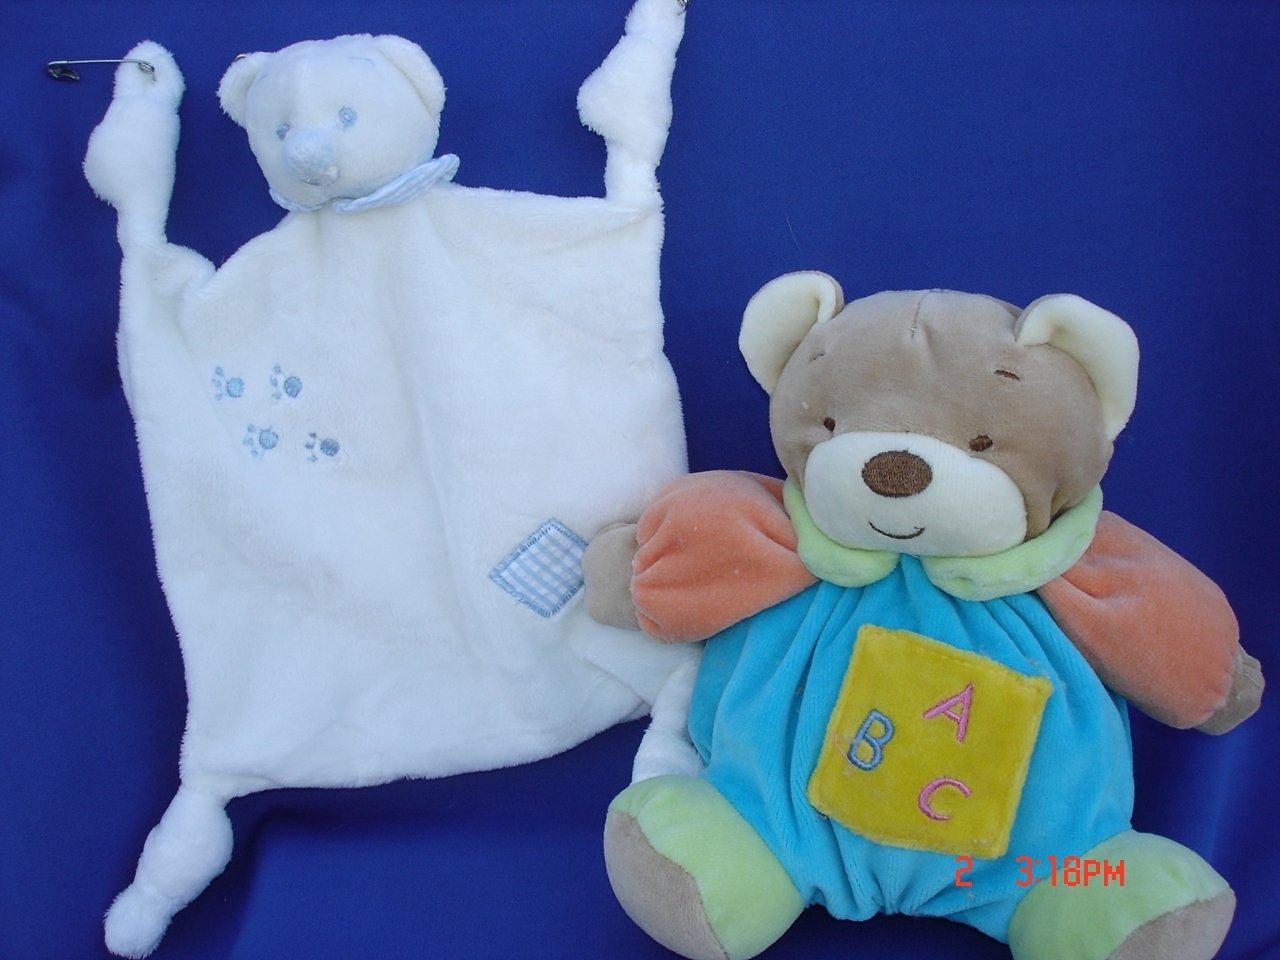 "Ultra Soft Baby Blue Teddy Bear Plush Blankie 7.5""x7.5"" Teething Blanket Lovie and My First Baby Blue Plush Teddy Bear Stuffed Animal Toy Rattle 7"" Tall, 2 Pcs Set"